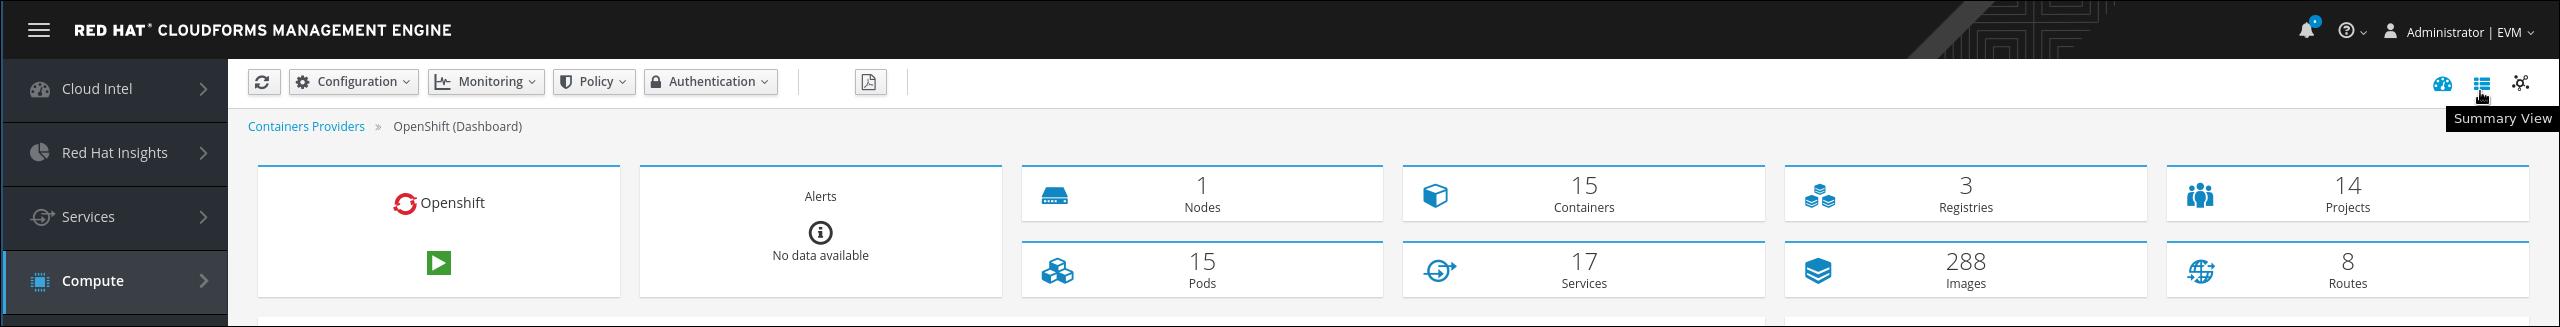 OpenShift provider summary button